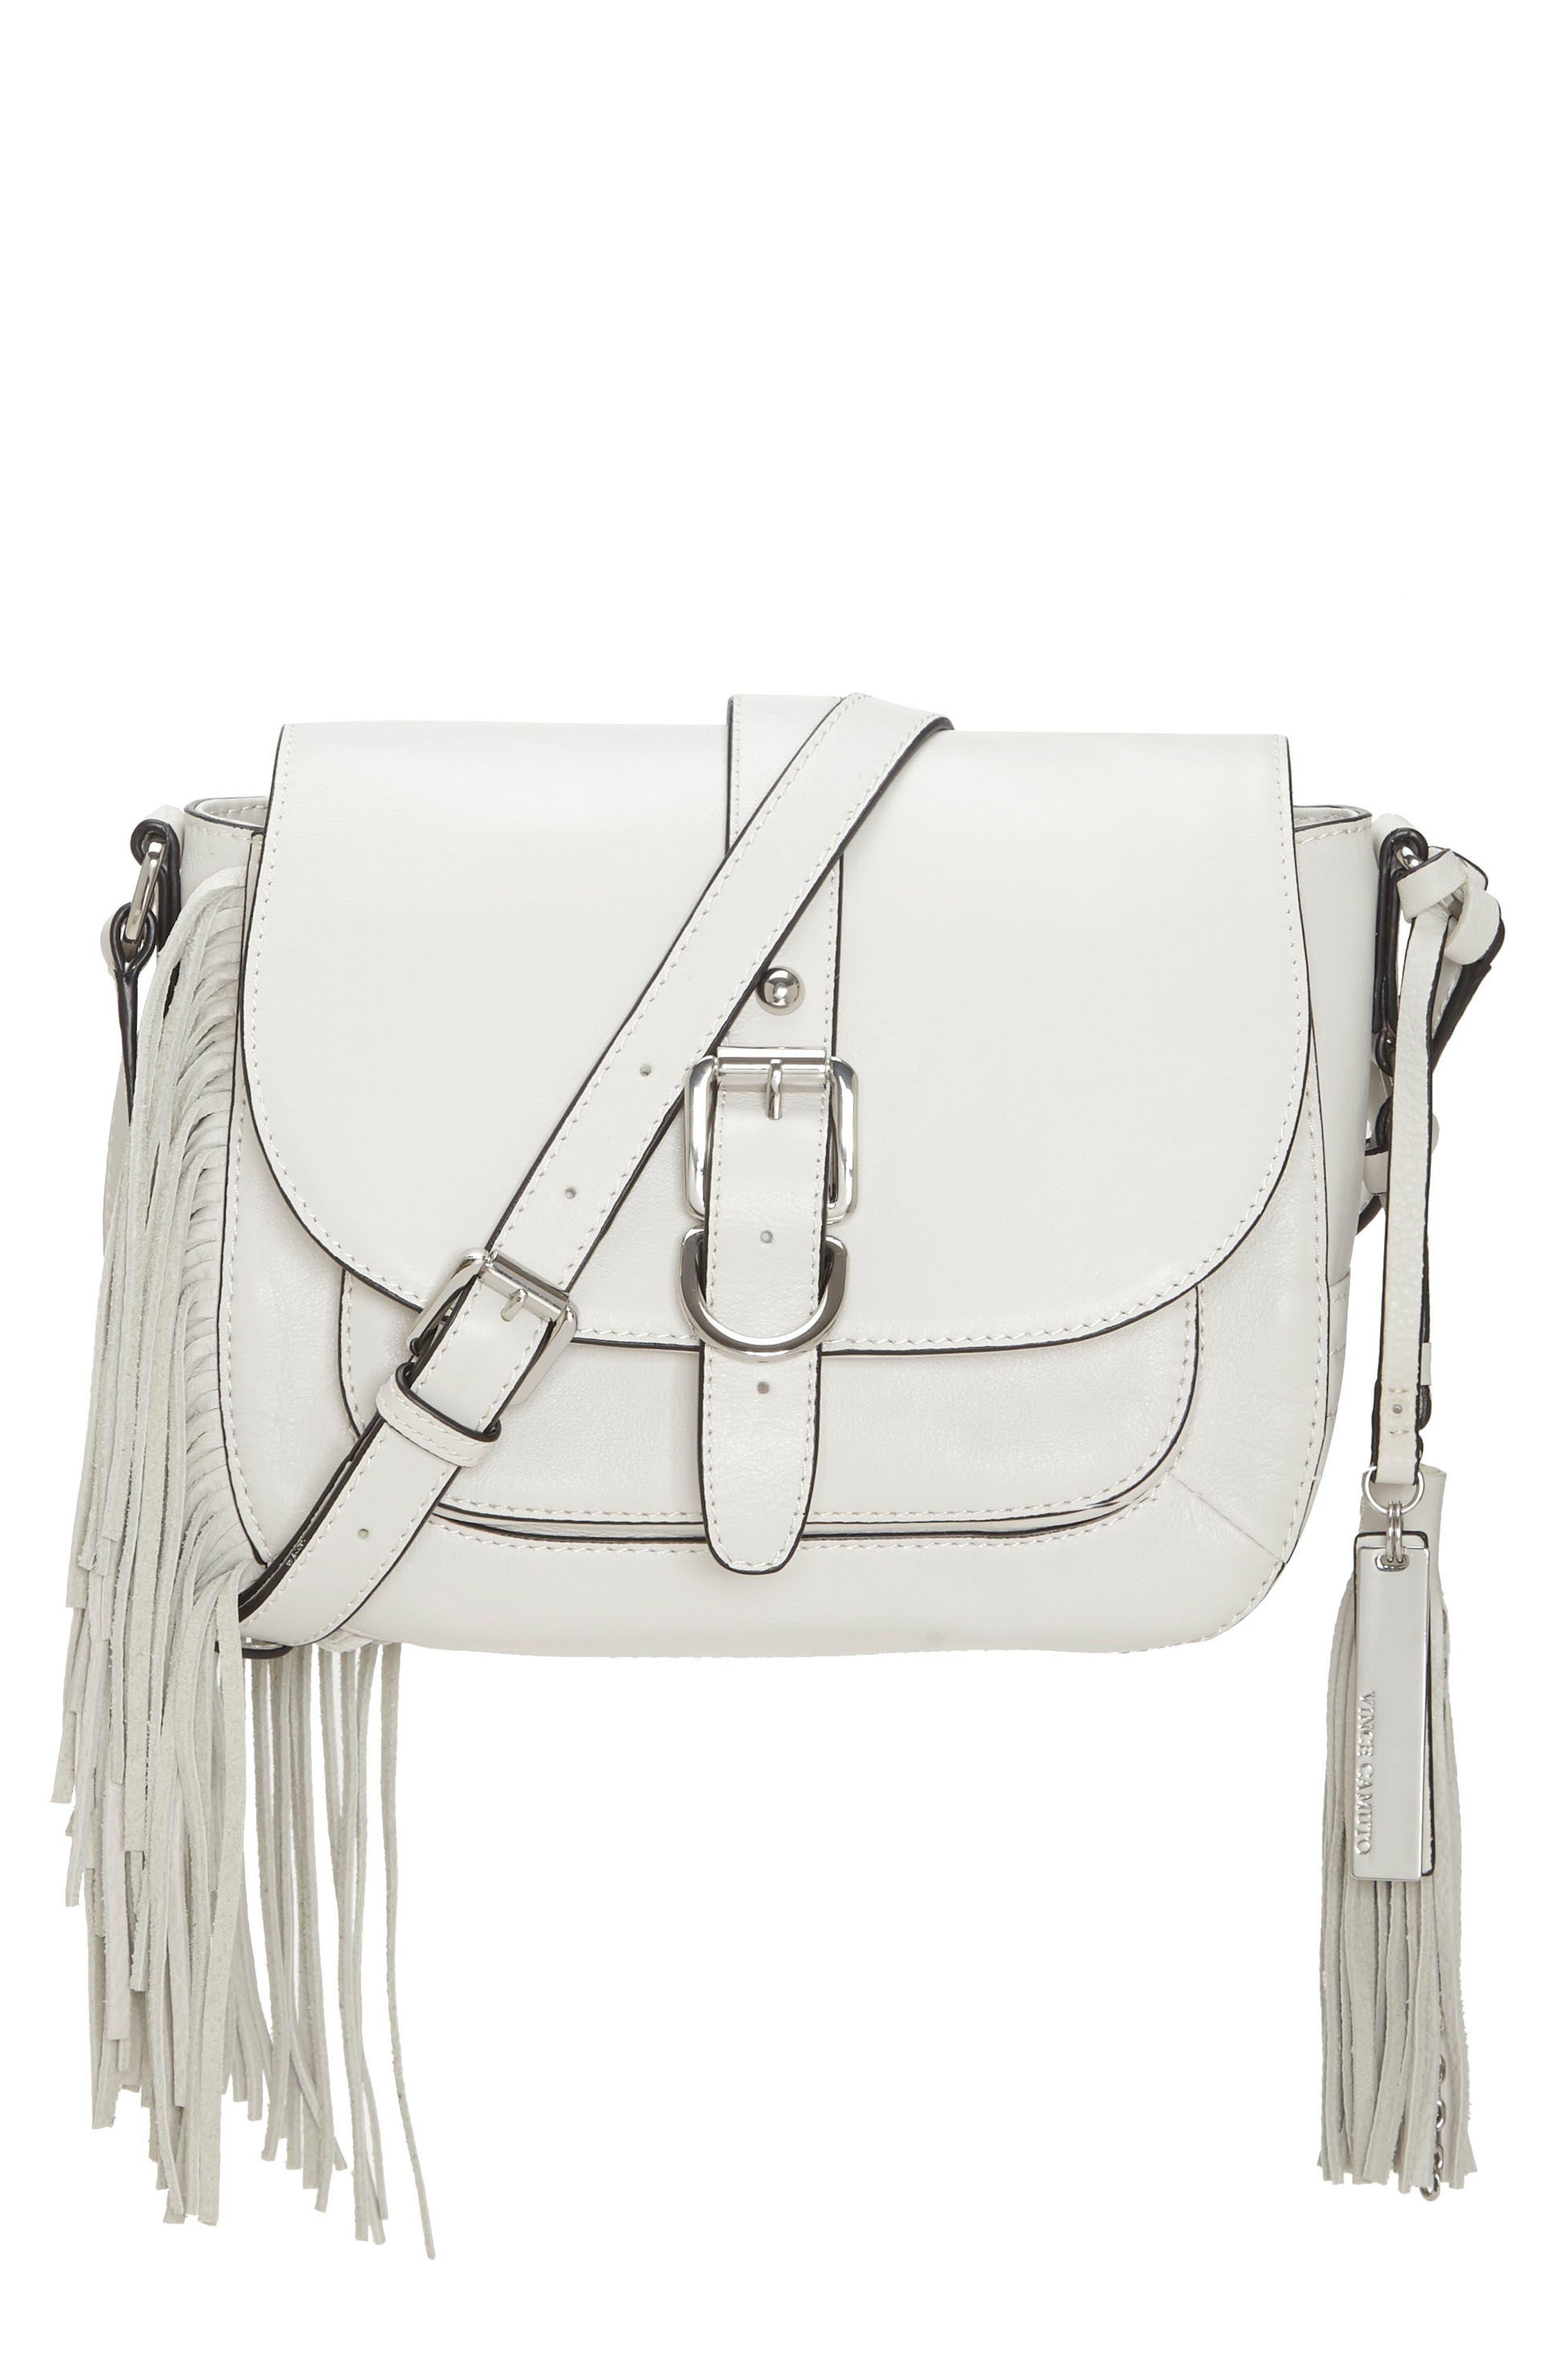 Hil Leather Crossbody Bag,                             Main thumbnail 1, color,                             Vaporous Grey